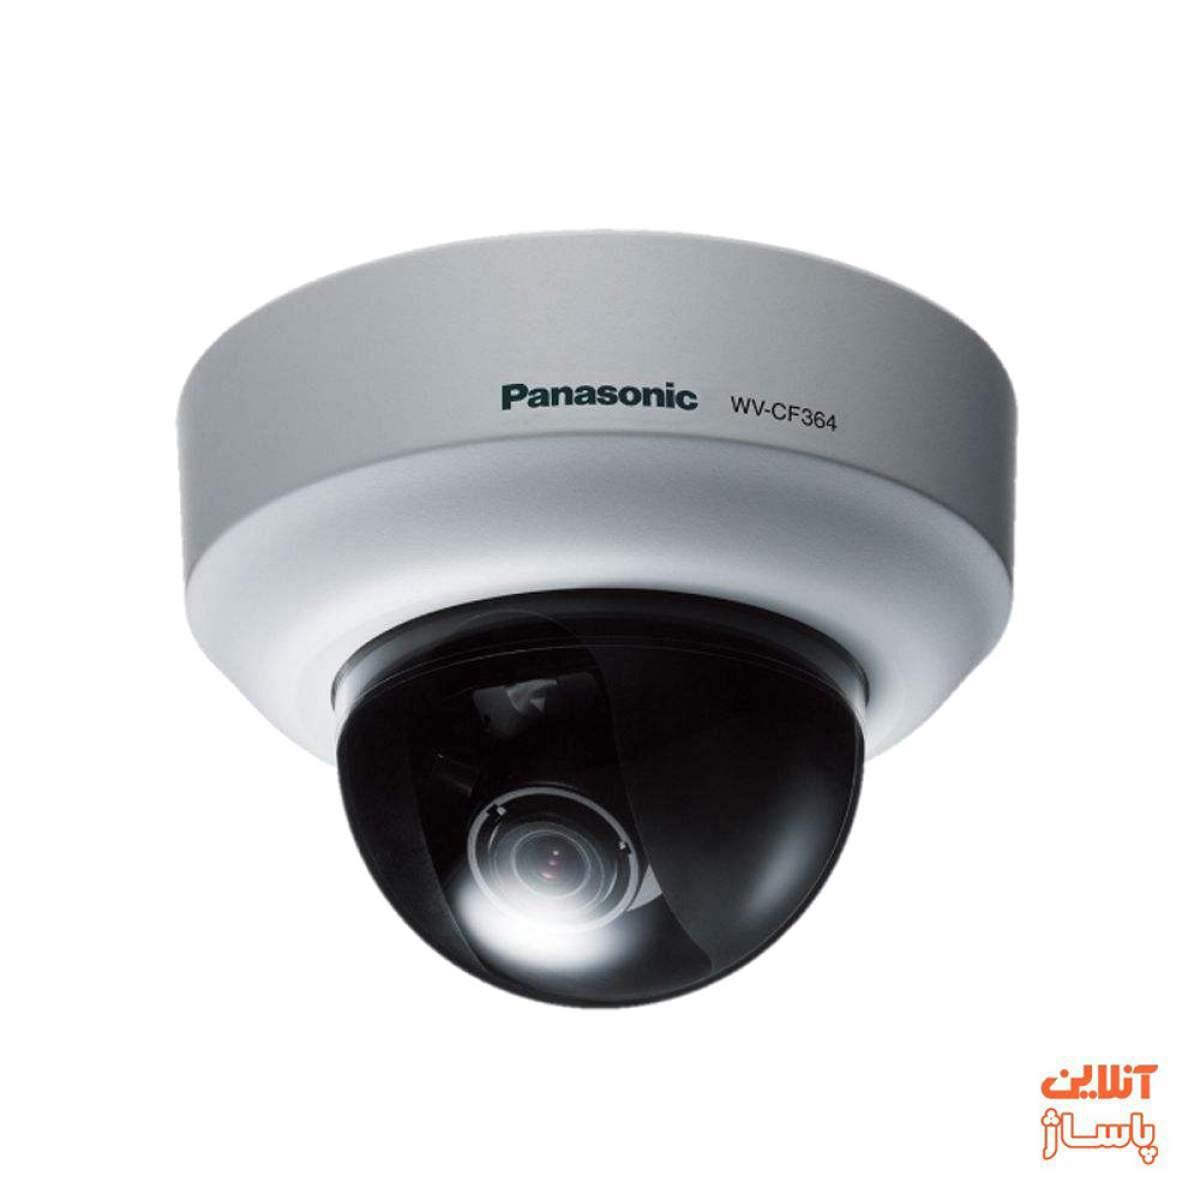 دوربین مداربسته آنالوگ پاناسونیک مدل WV-CF364E